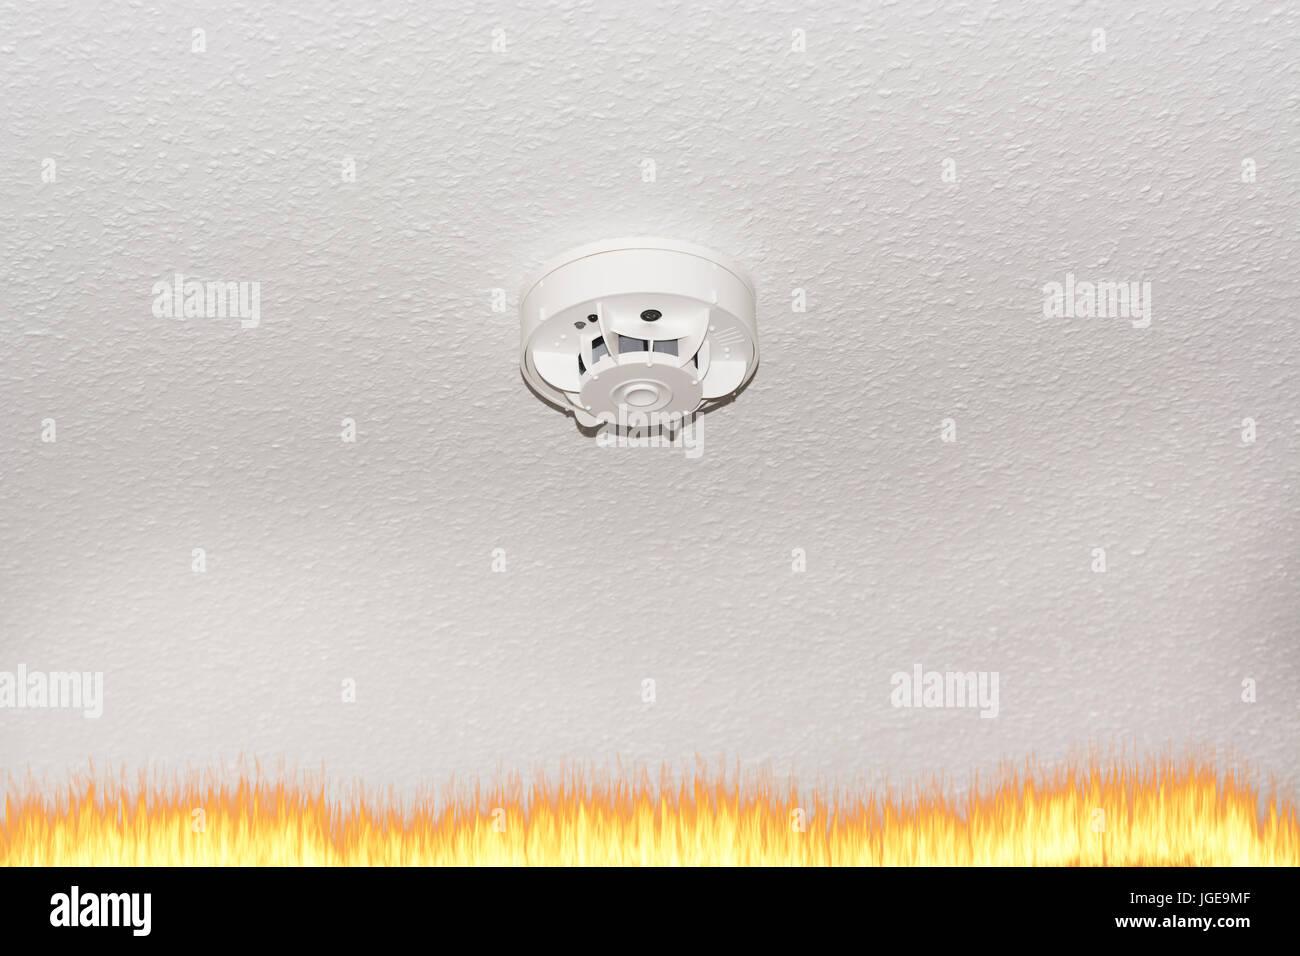 Smoke detector on the ceiling with red warning light sensor and smoke. - Stock Image